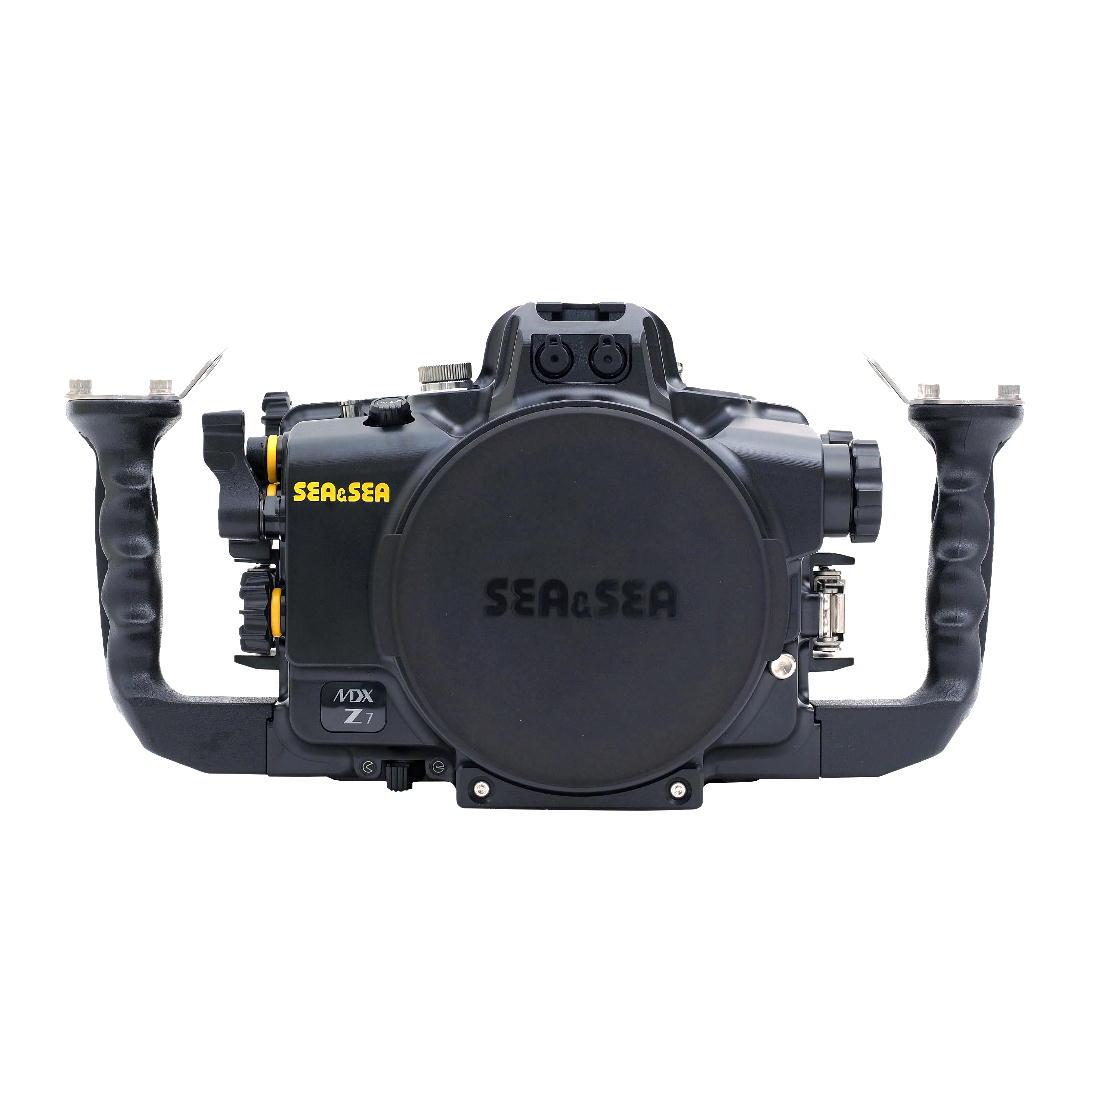 SEA&SEA MDX-Z7 ハウジング(ニコン フルサイズミラーレスカメラ「Z7/Z6」用)